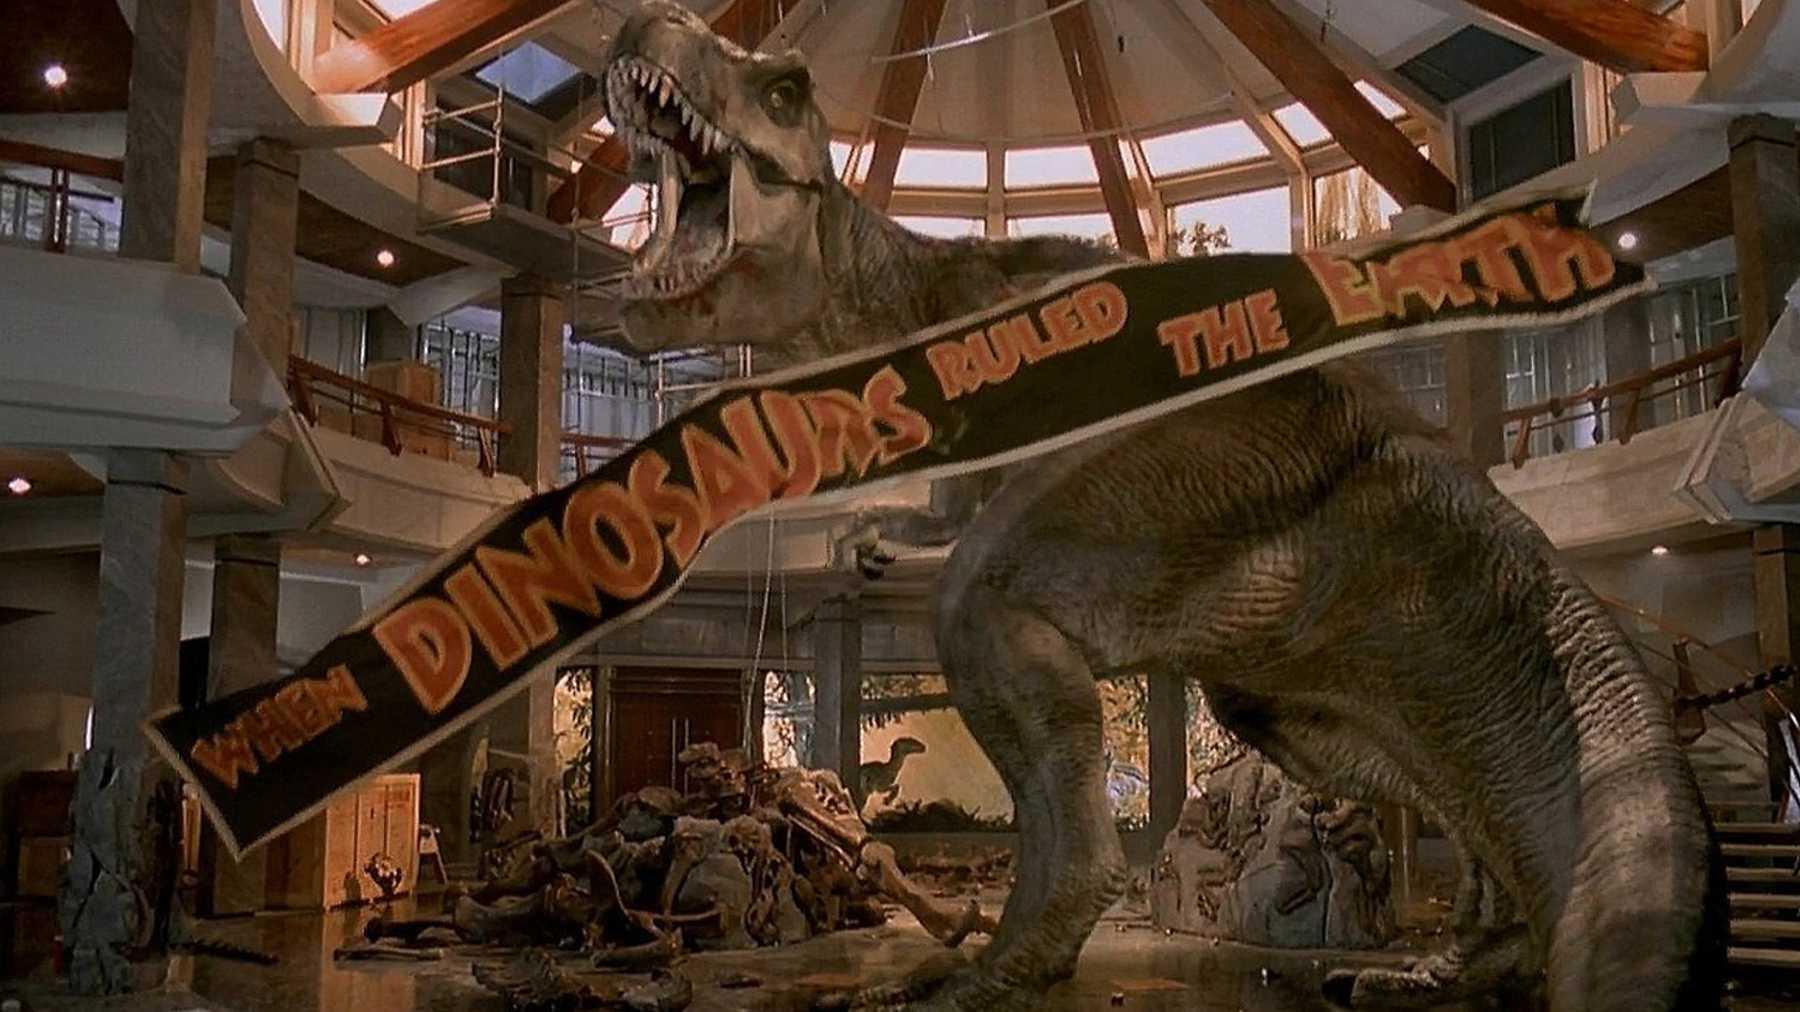 Jurassic Park 1993 Mahaiwe Performing Arts Center